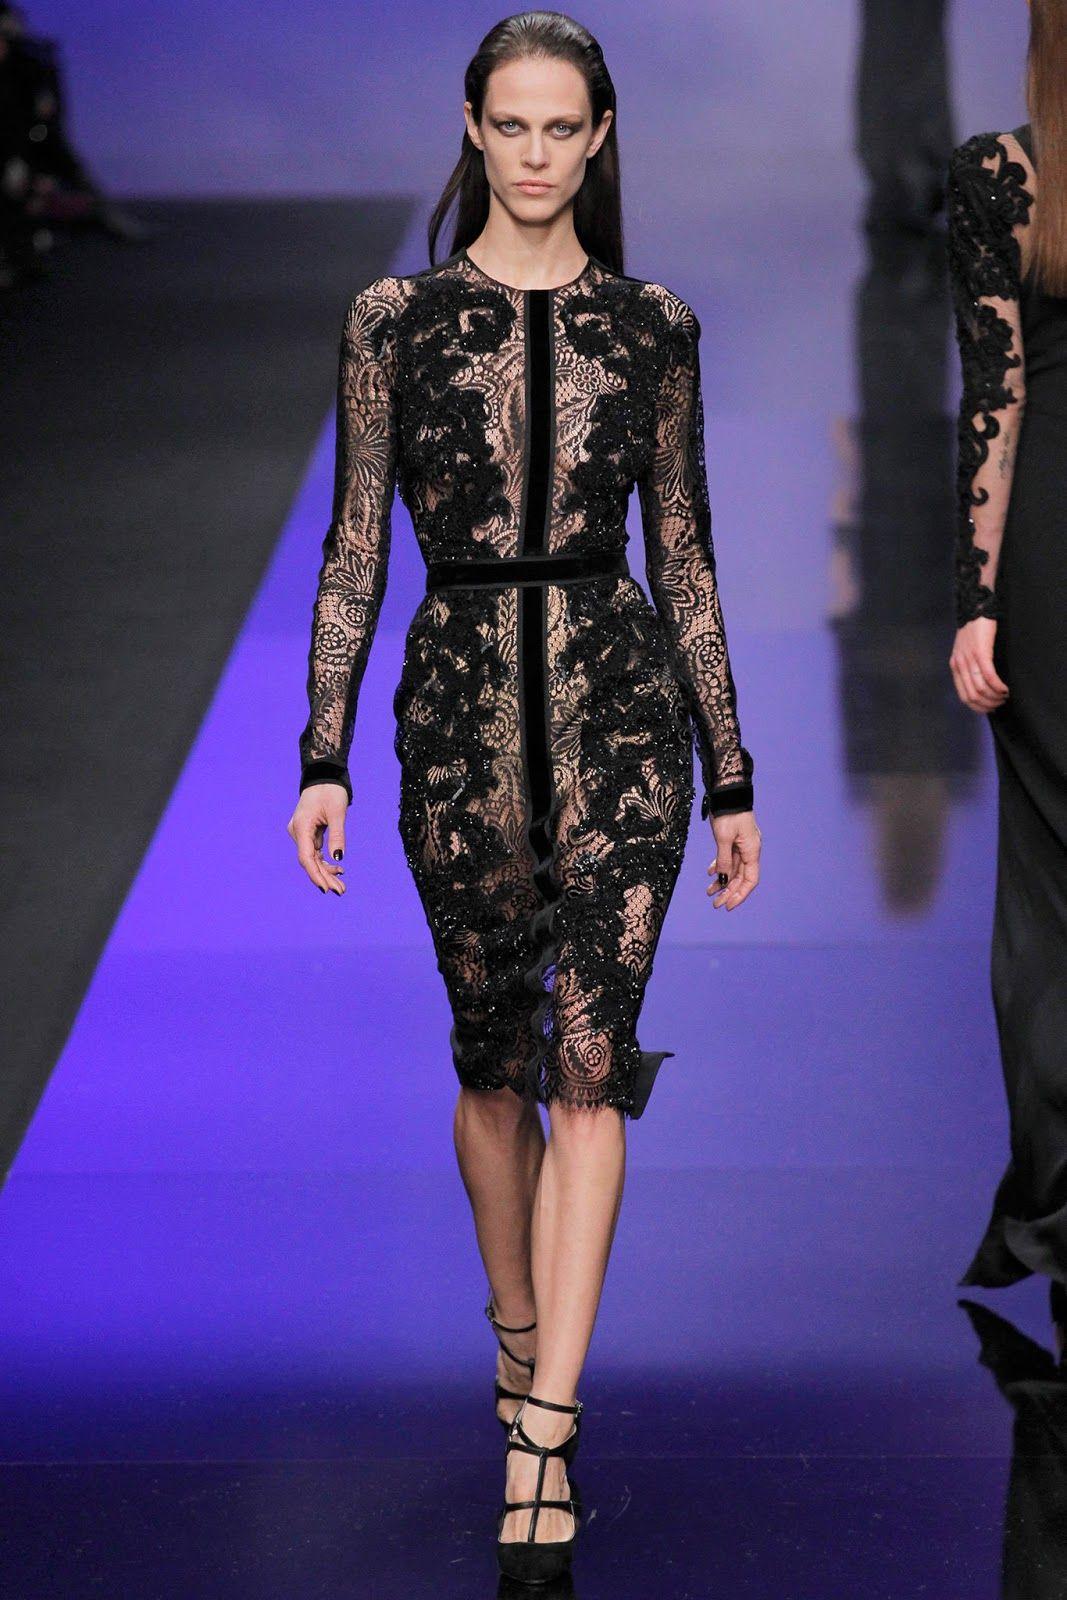 Elie Saab Fall Winter 2013 Collection Paris Fashion Week